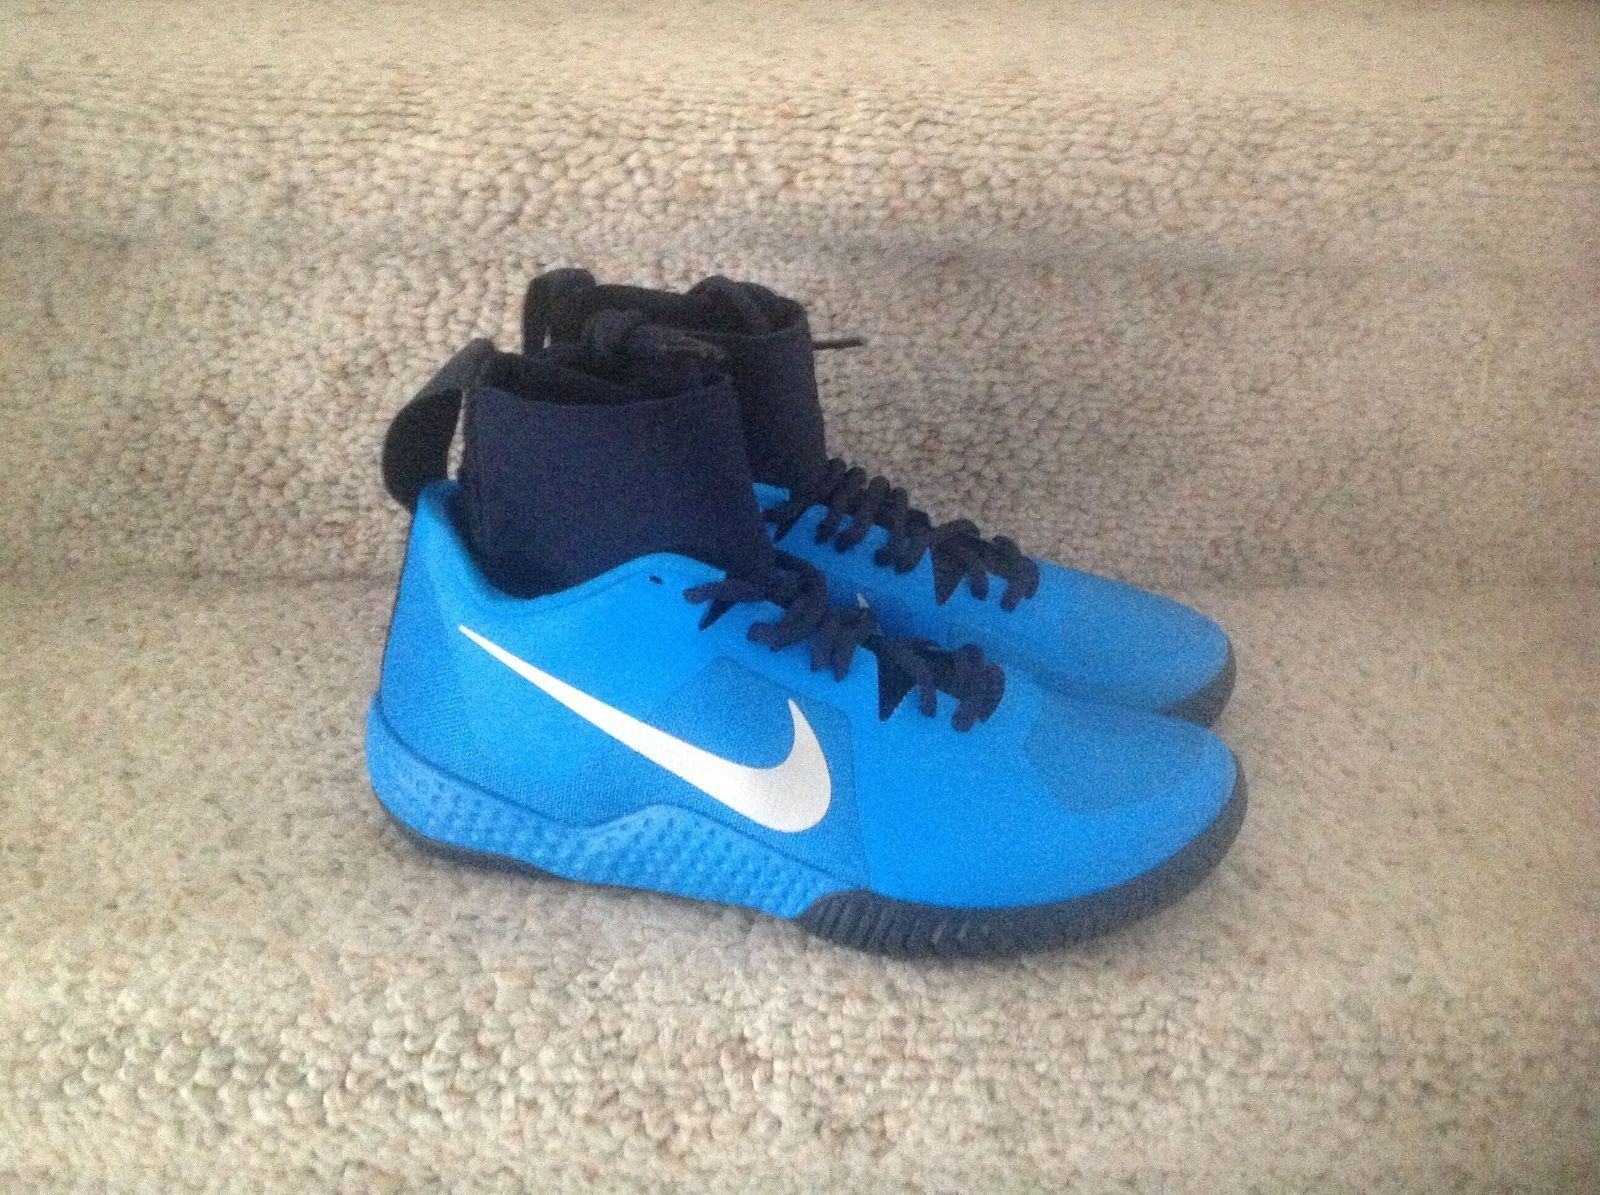 New Sz 7 Women's Nike Flare Tennis Serena Williams Blue Black 810964-404